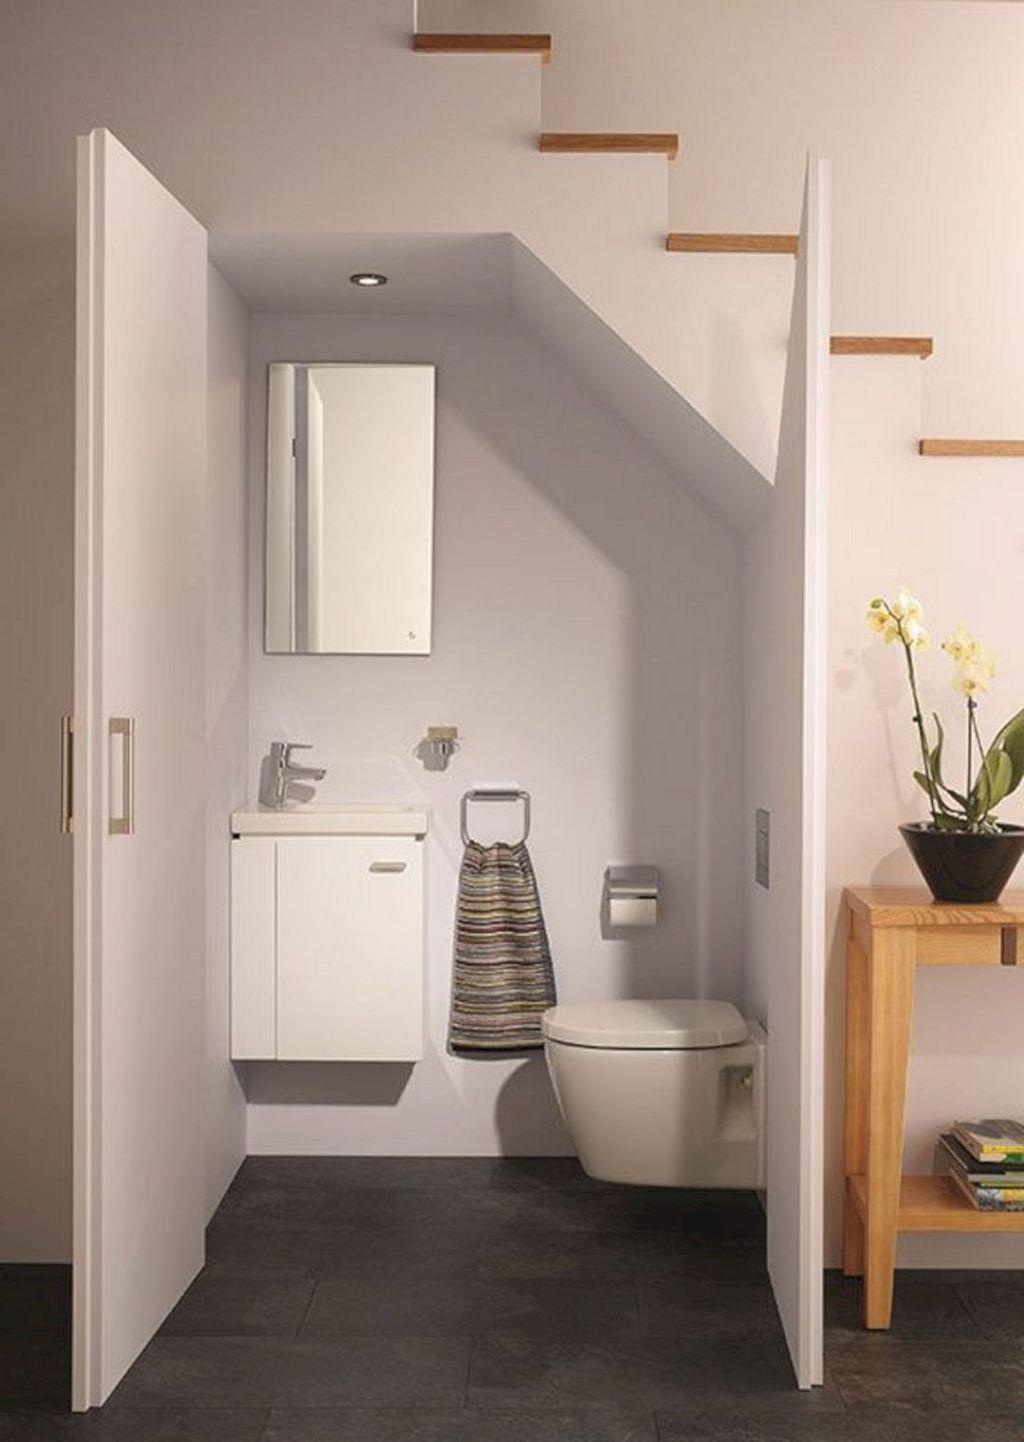 Fabulous Minimalist Bathroom Decor Ideas That Become Everyones Dream 15